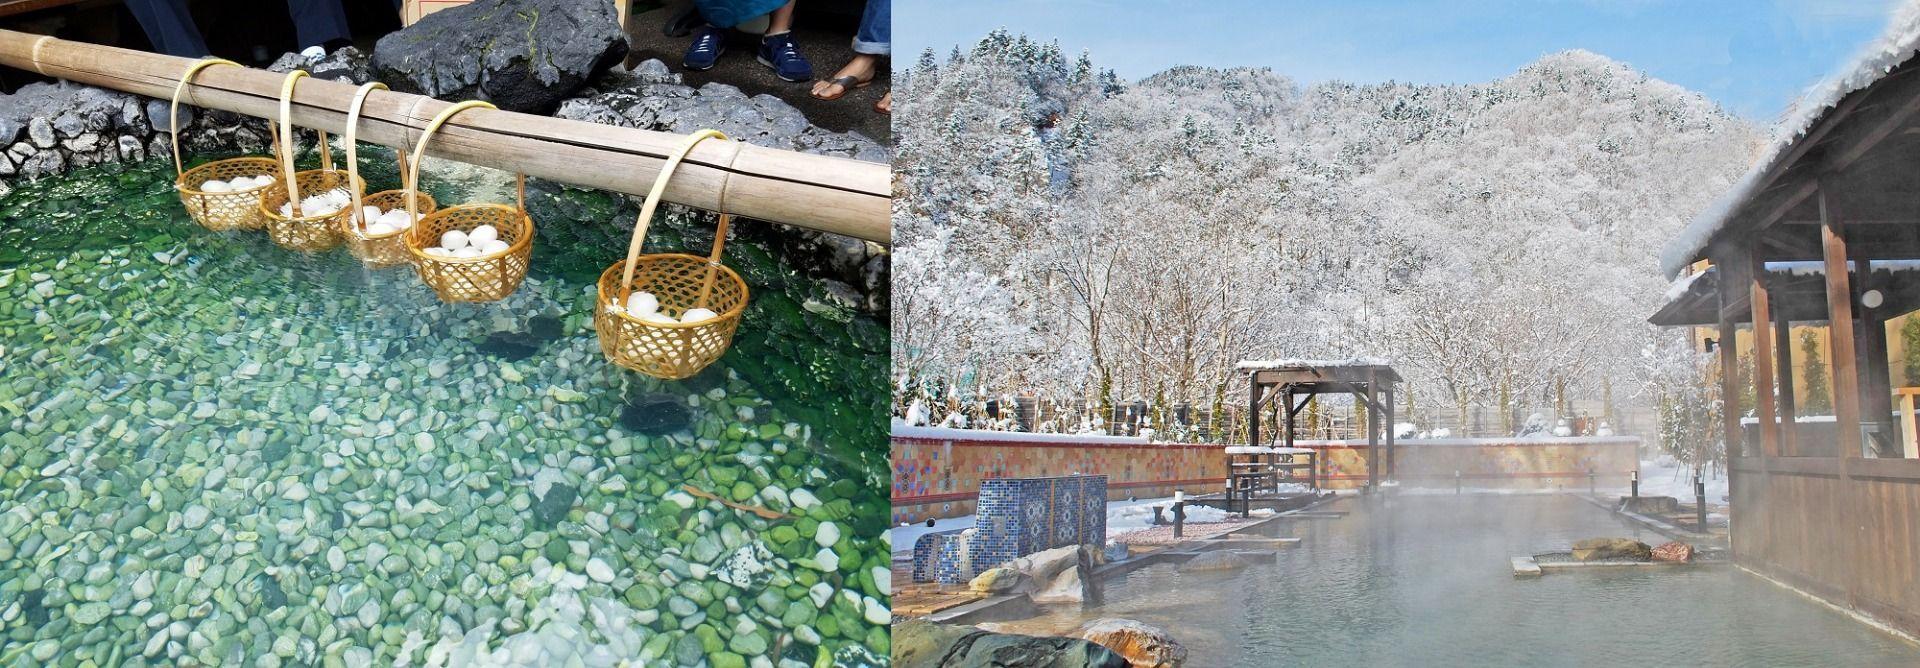 December Japan Onsen hot spring 温泉